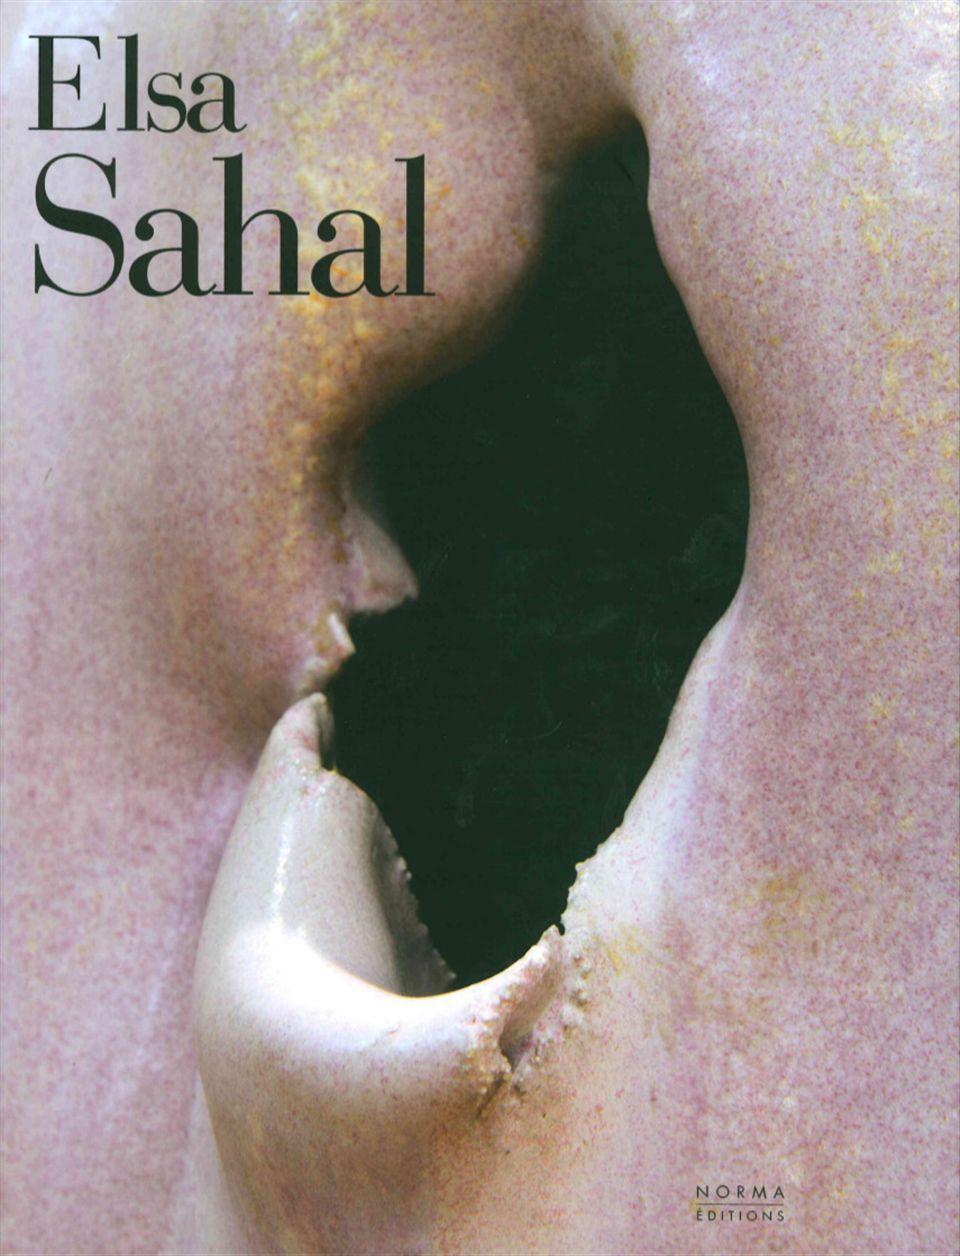 ELSA SAHAL